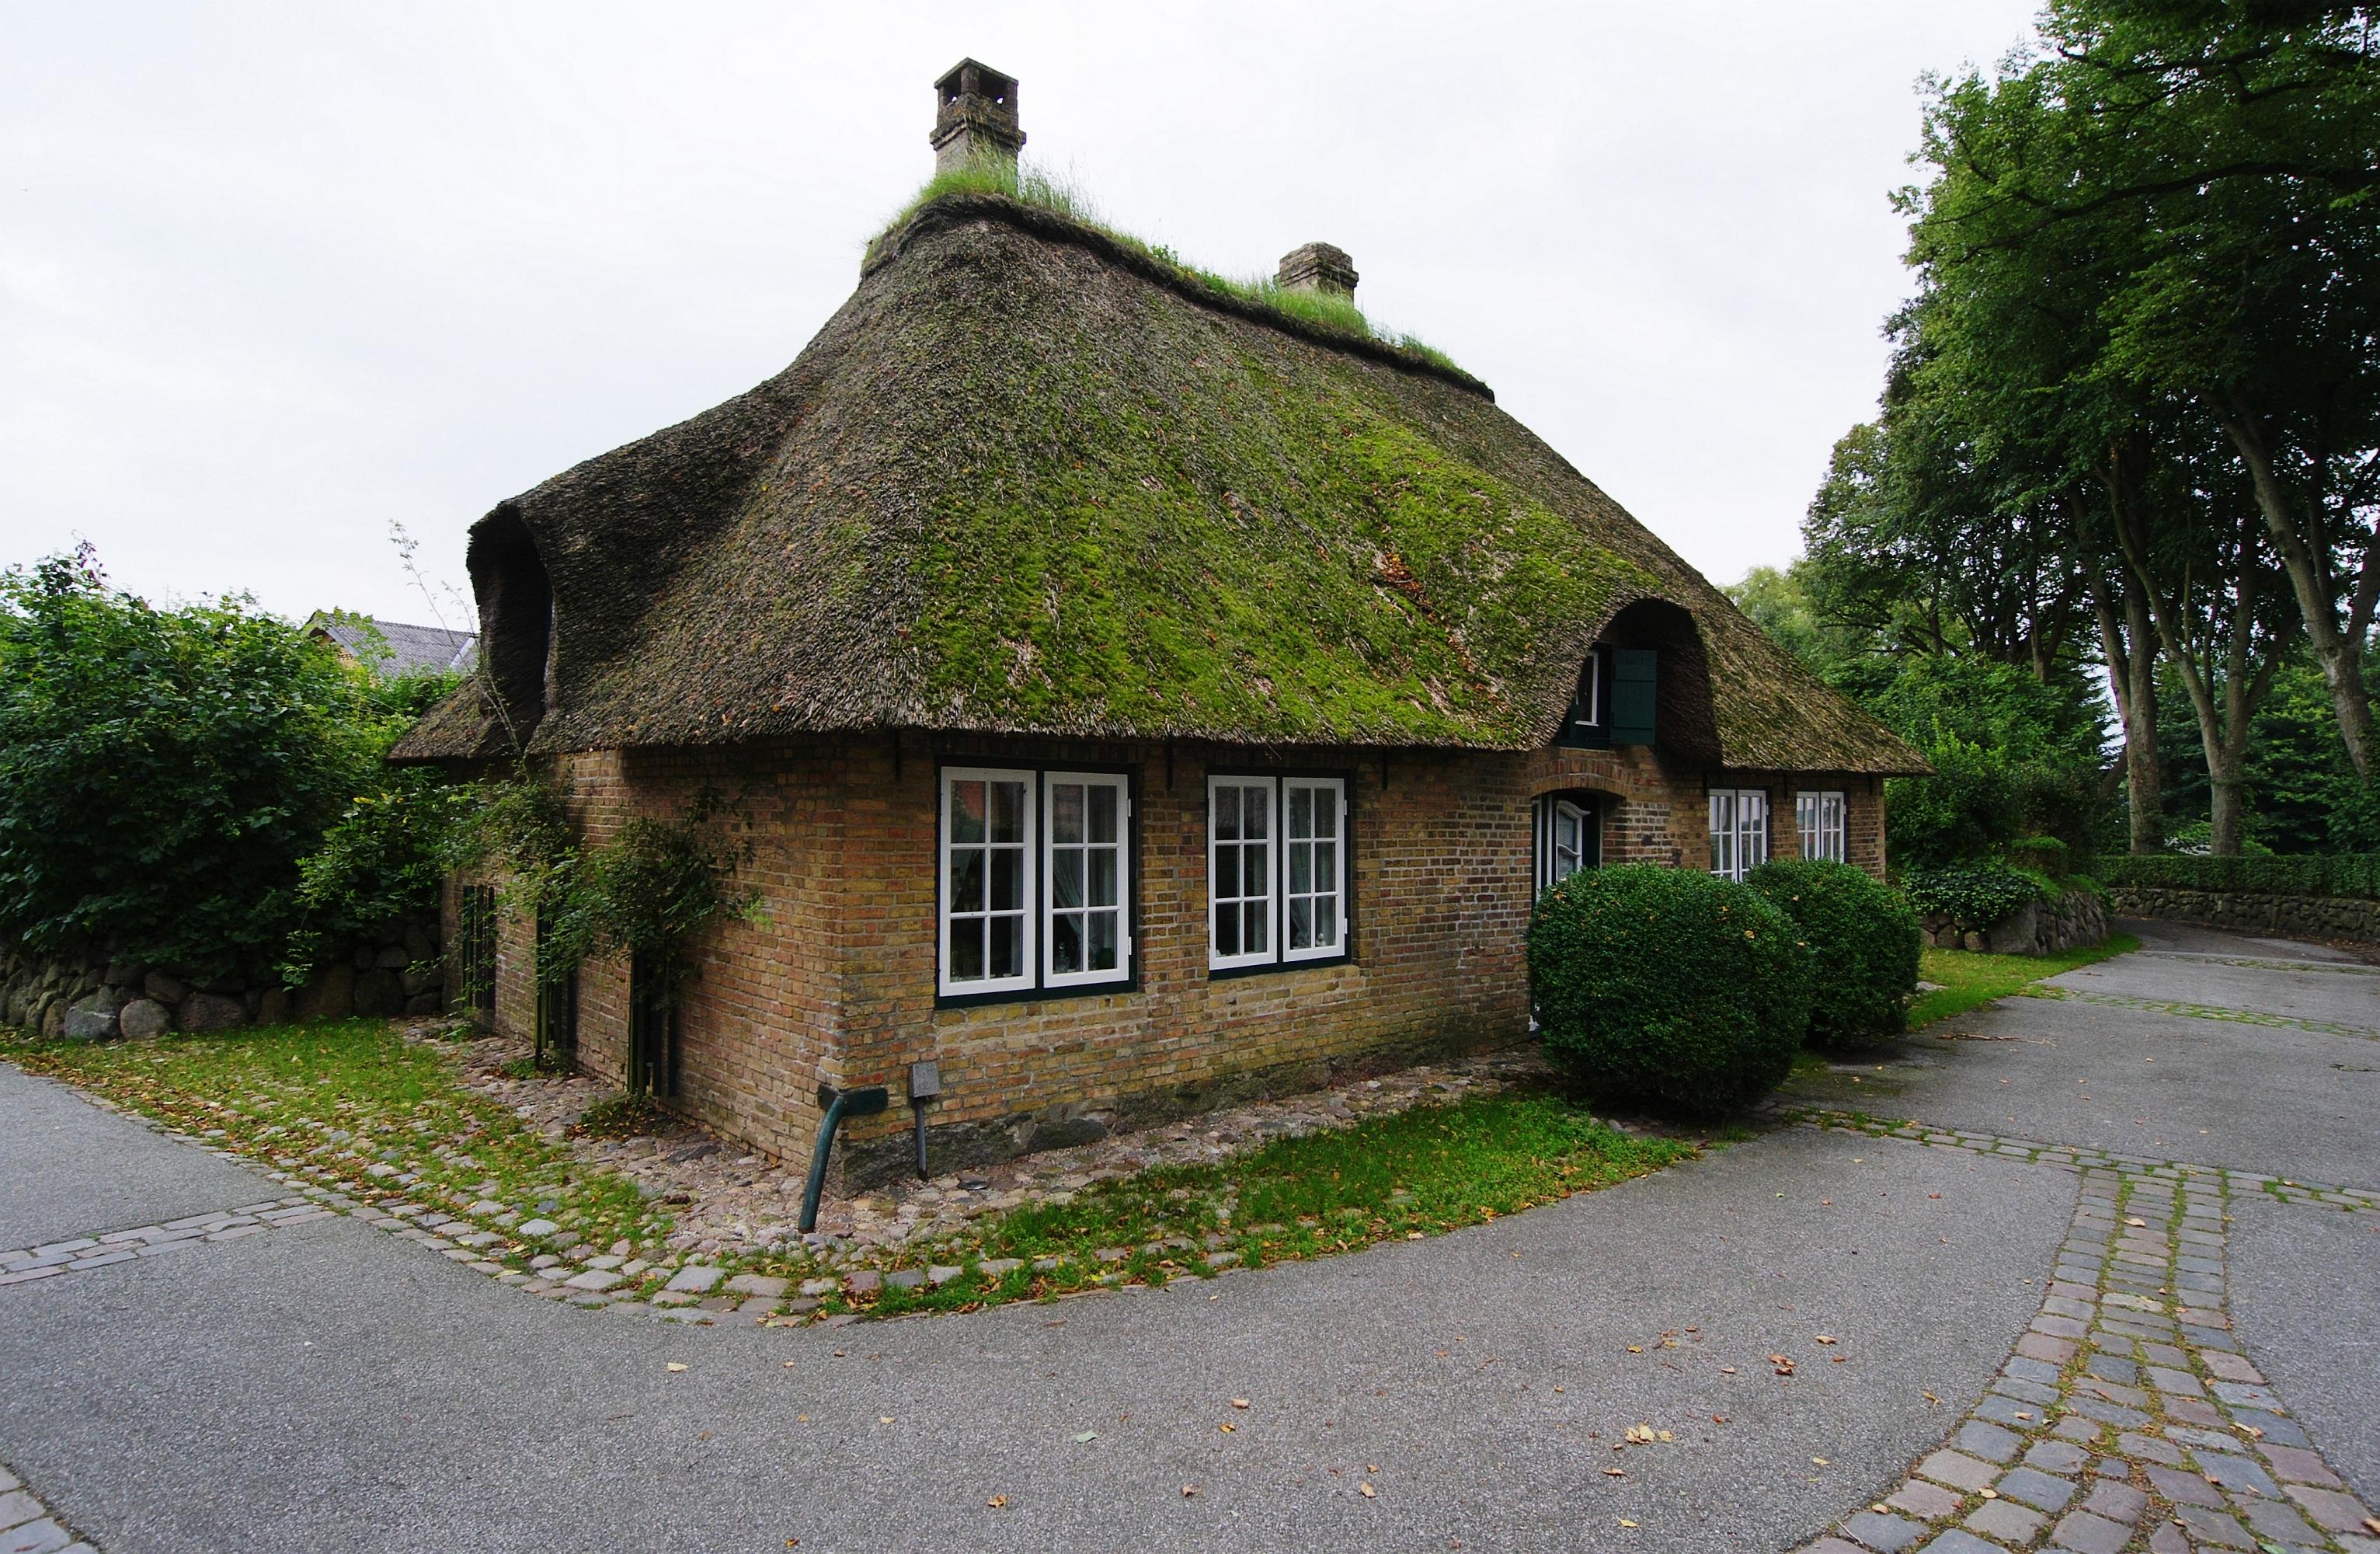 Casa natale di Nicolaus Bruhns